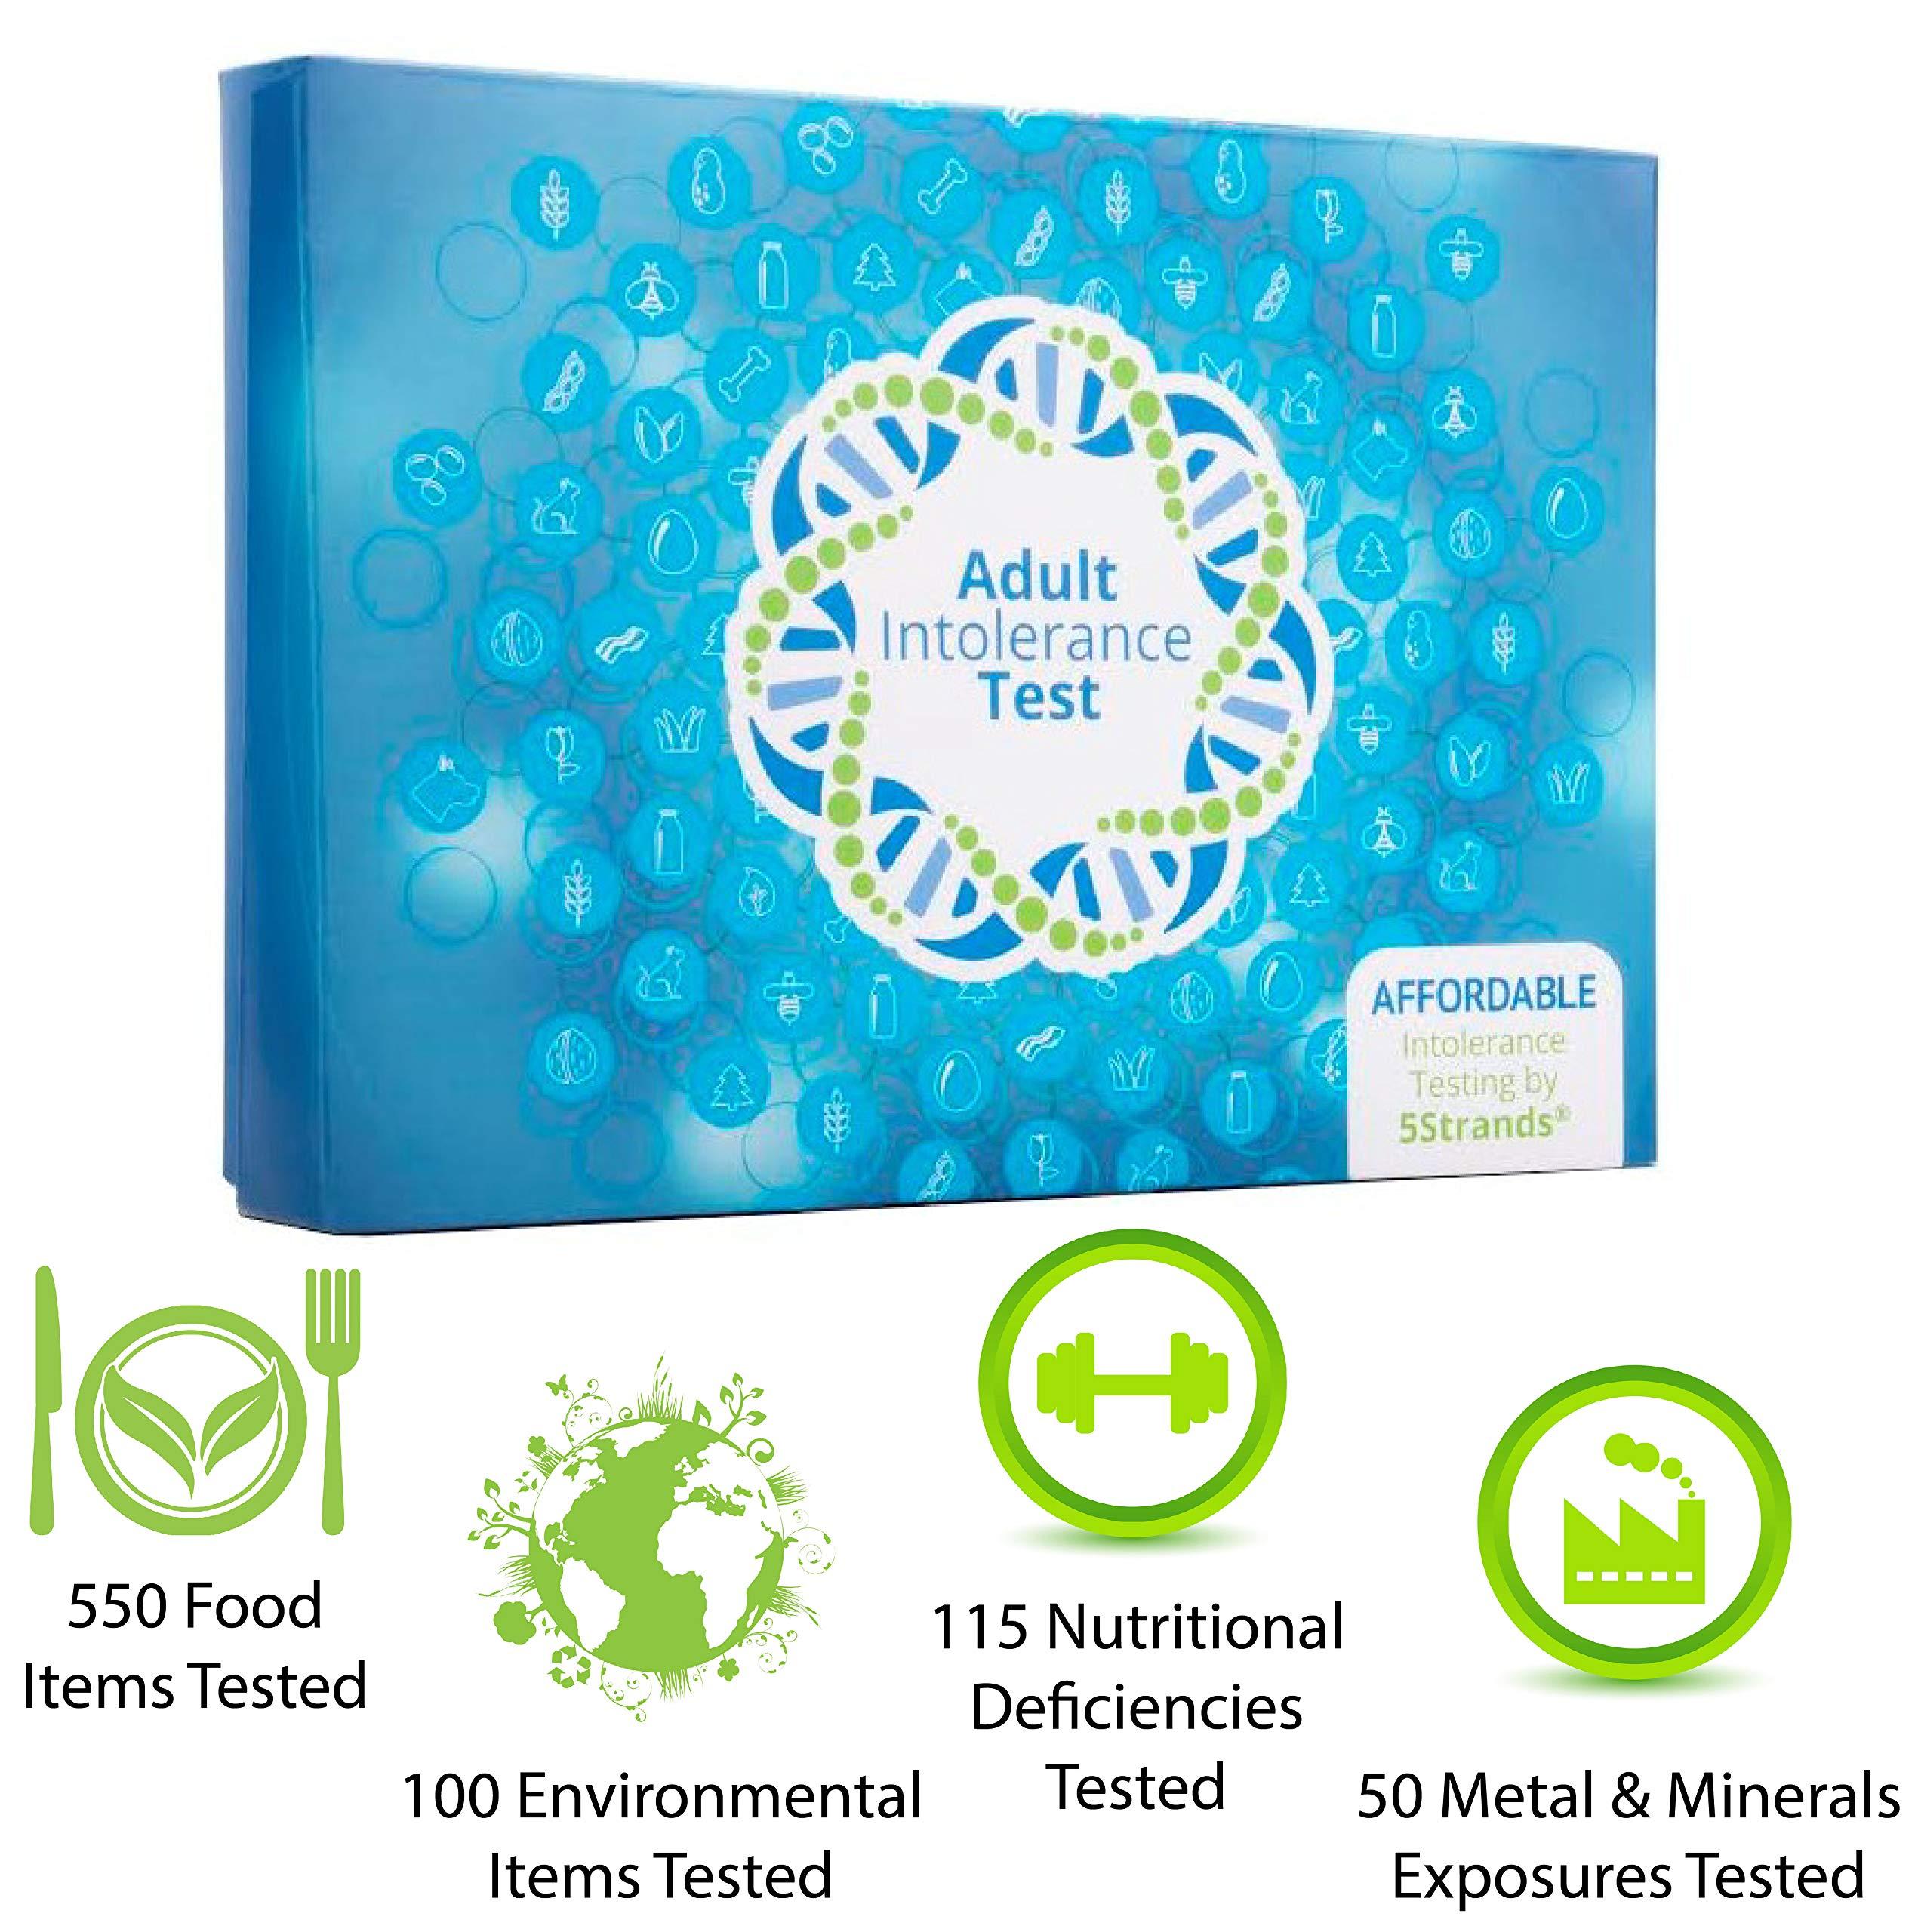 5Strands Affordable Intolerance Environmental Sensitivities